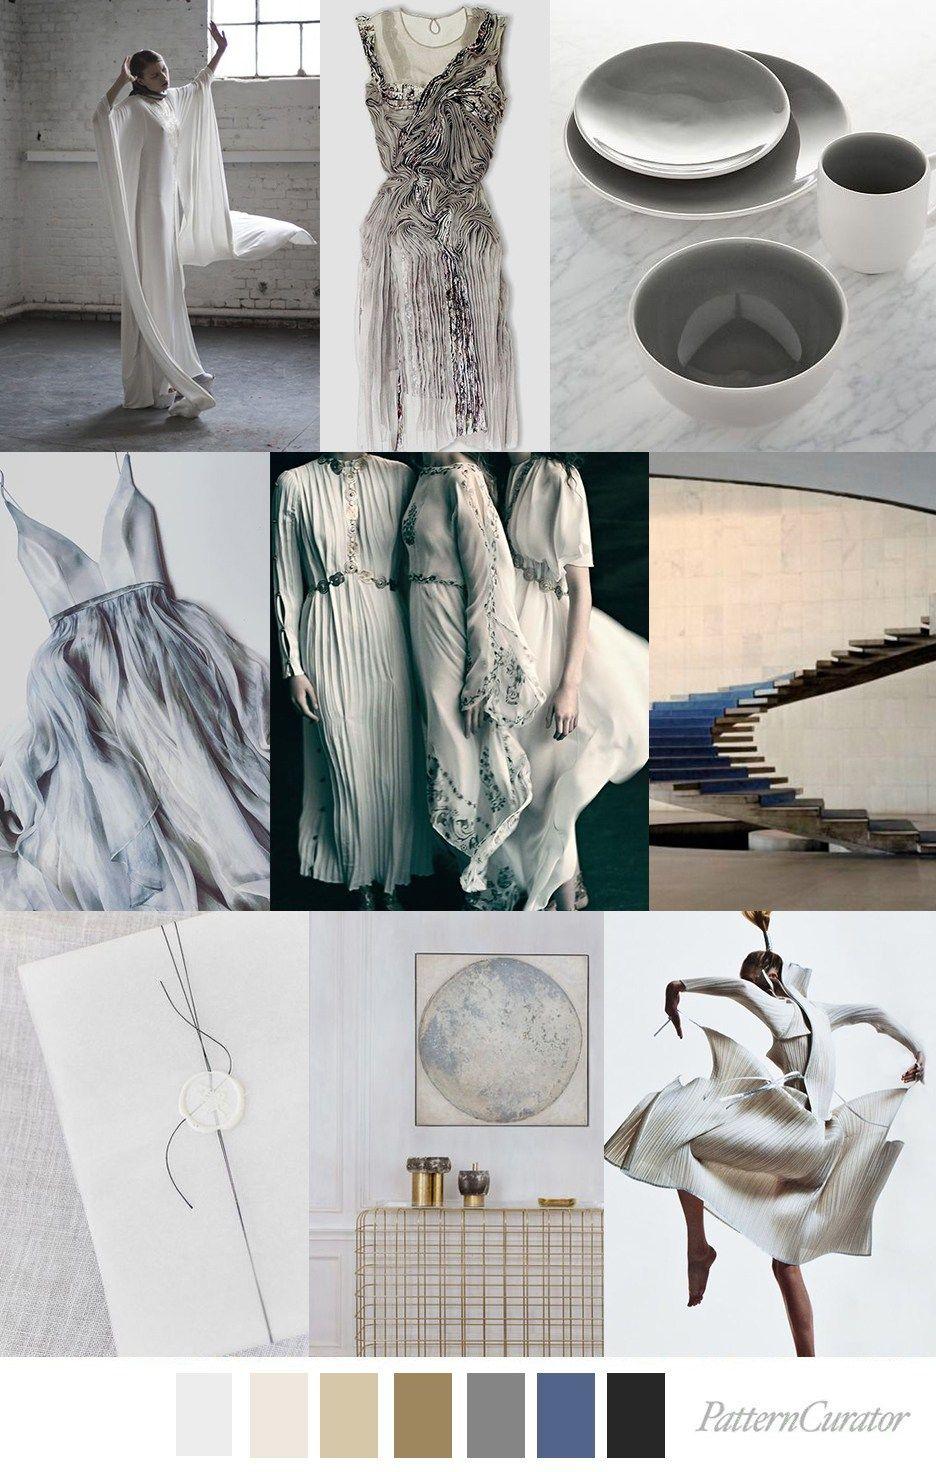 S/S 2018 colors trends: STYLE & GRACE